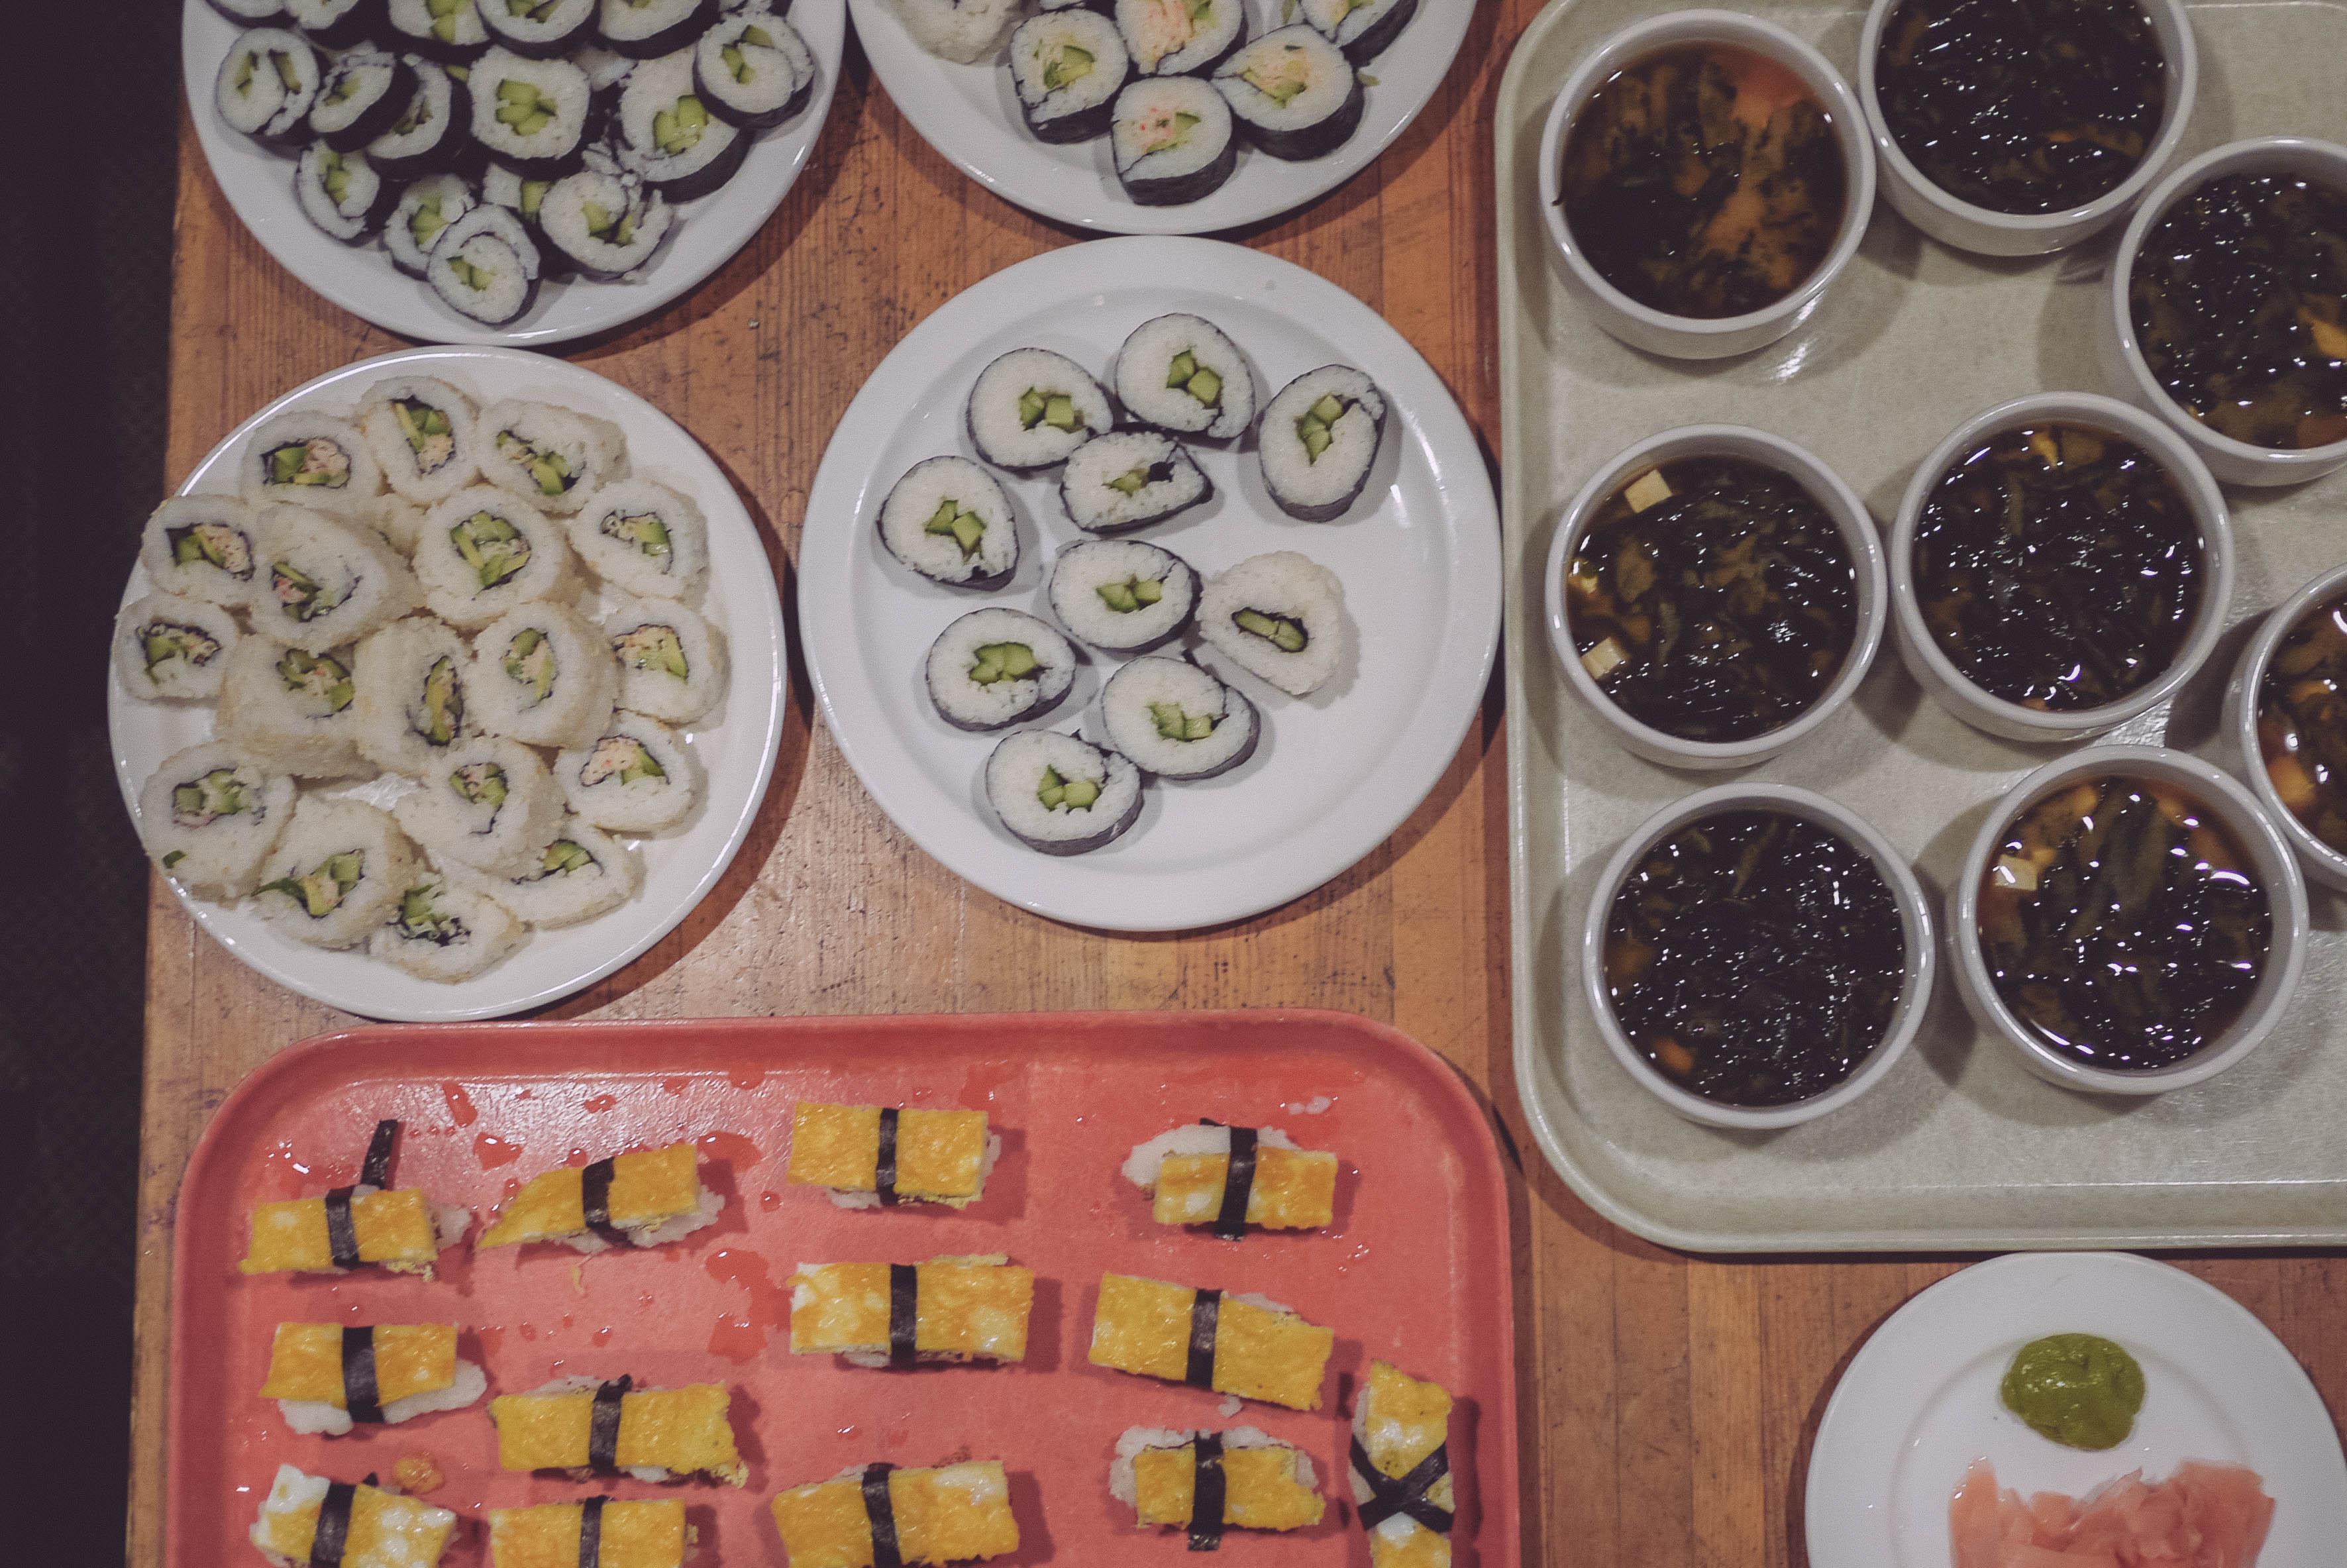 building a community around food - 4